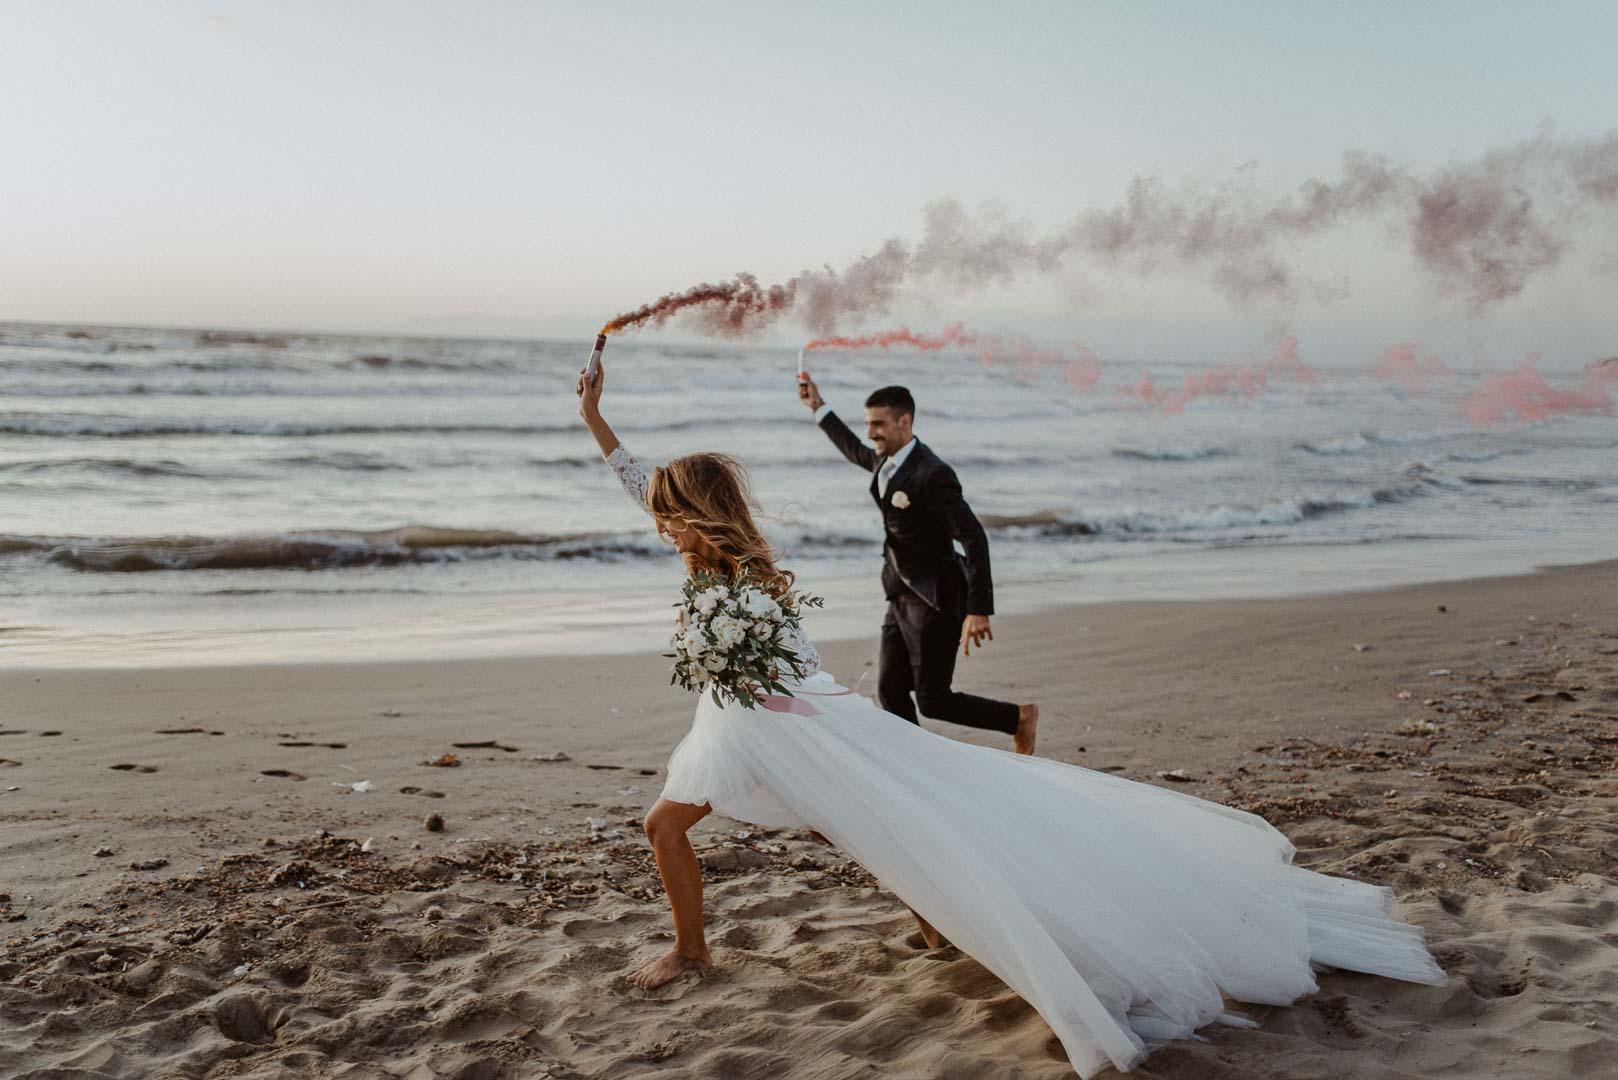 wedding-photographer-destination-fineart-bespoke-reportage-napoli-nabilah-vivianeizzo-spazio46-143